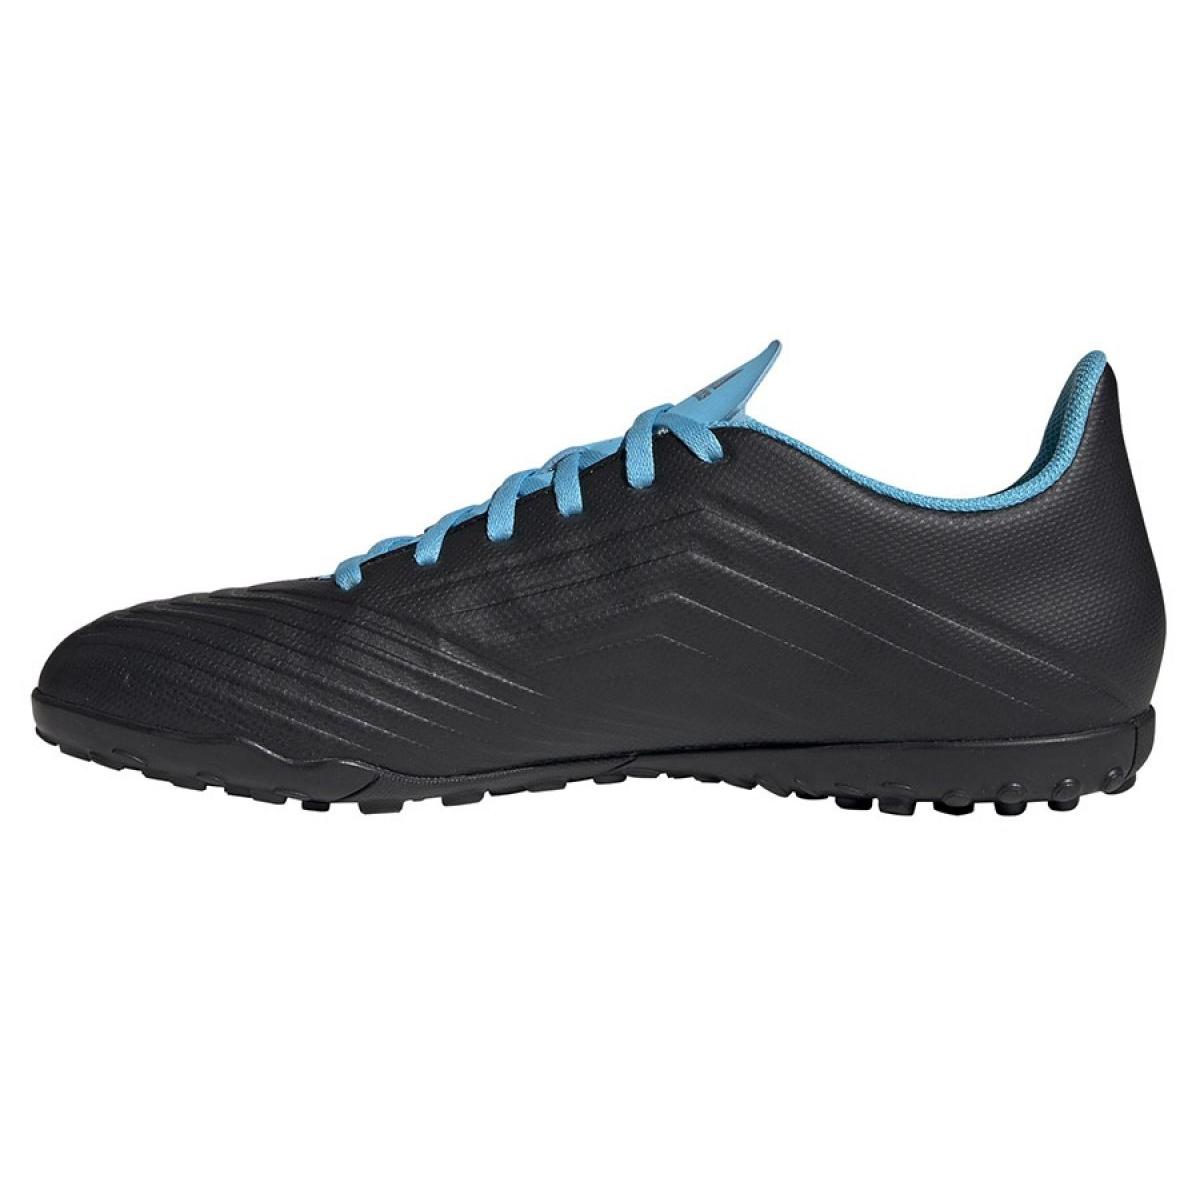 Adidas M Foot Chaussures 4 De Predator 19 Tf F35636 XZOiPkuT